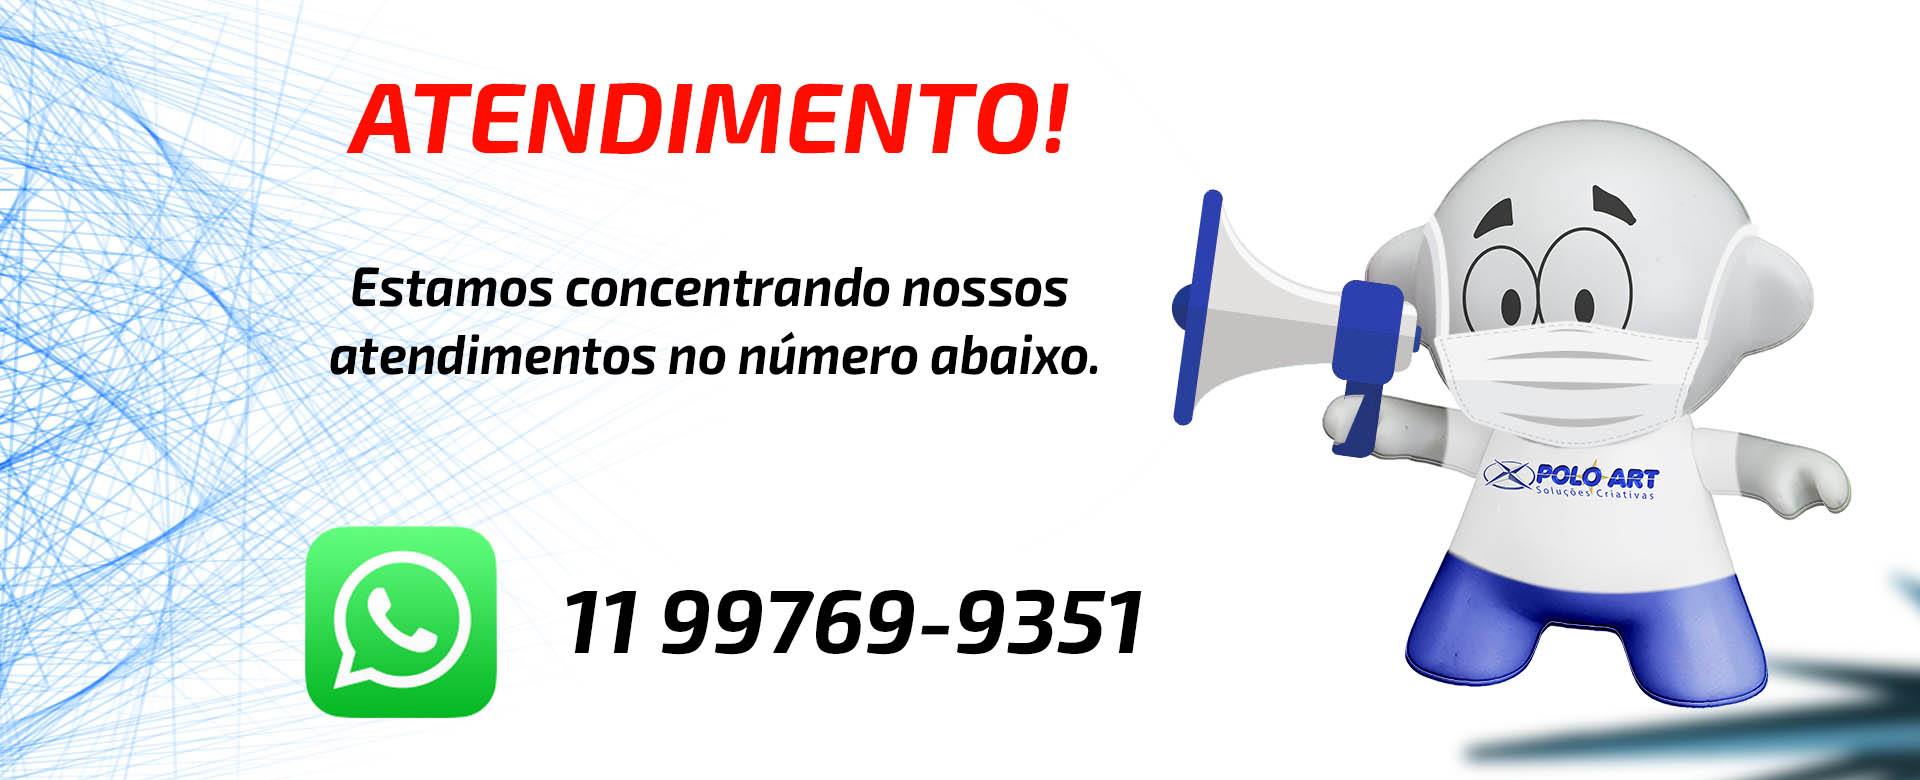 (Português) Atendimento